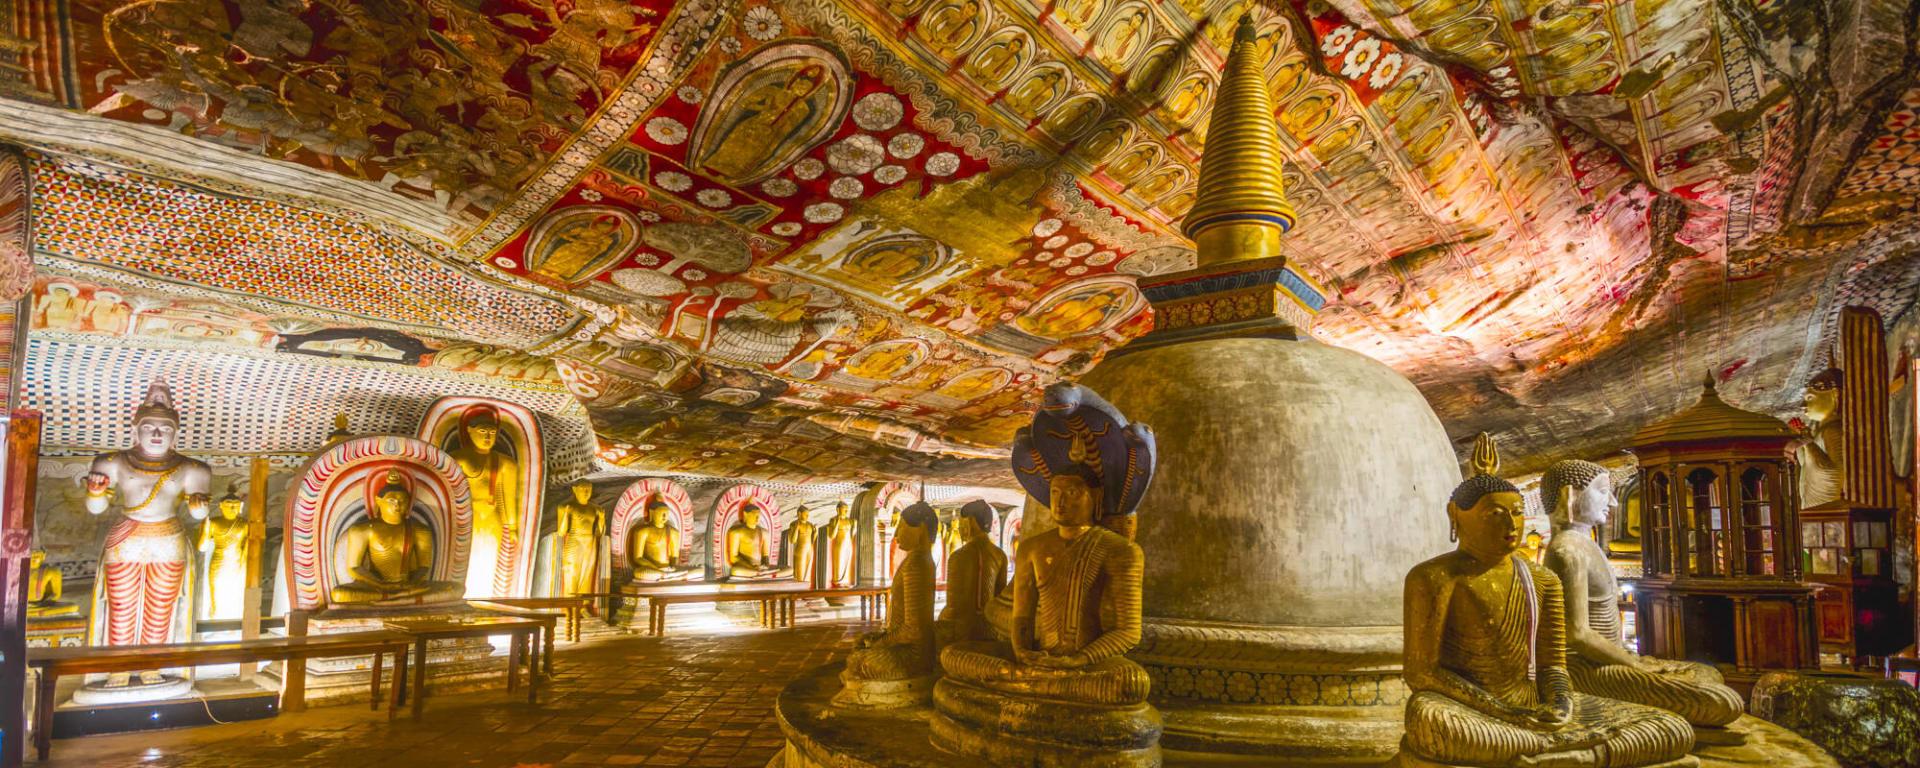 Sri Lanka entdecken mit Tischler Reisen: Sri Lanka Dambulla Hoehlentempel